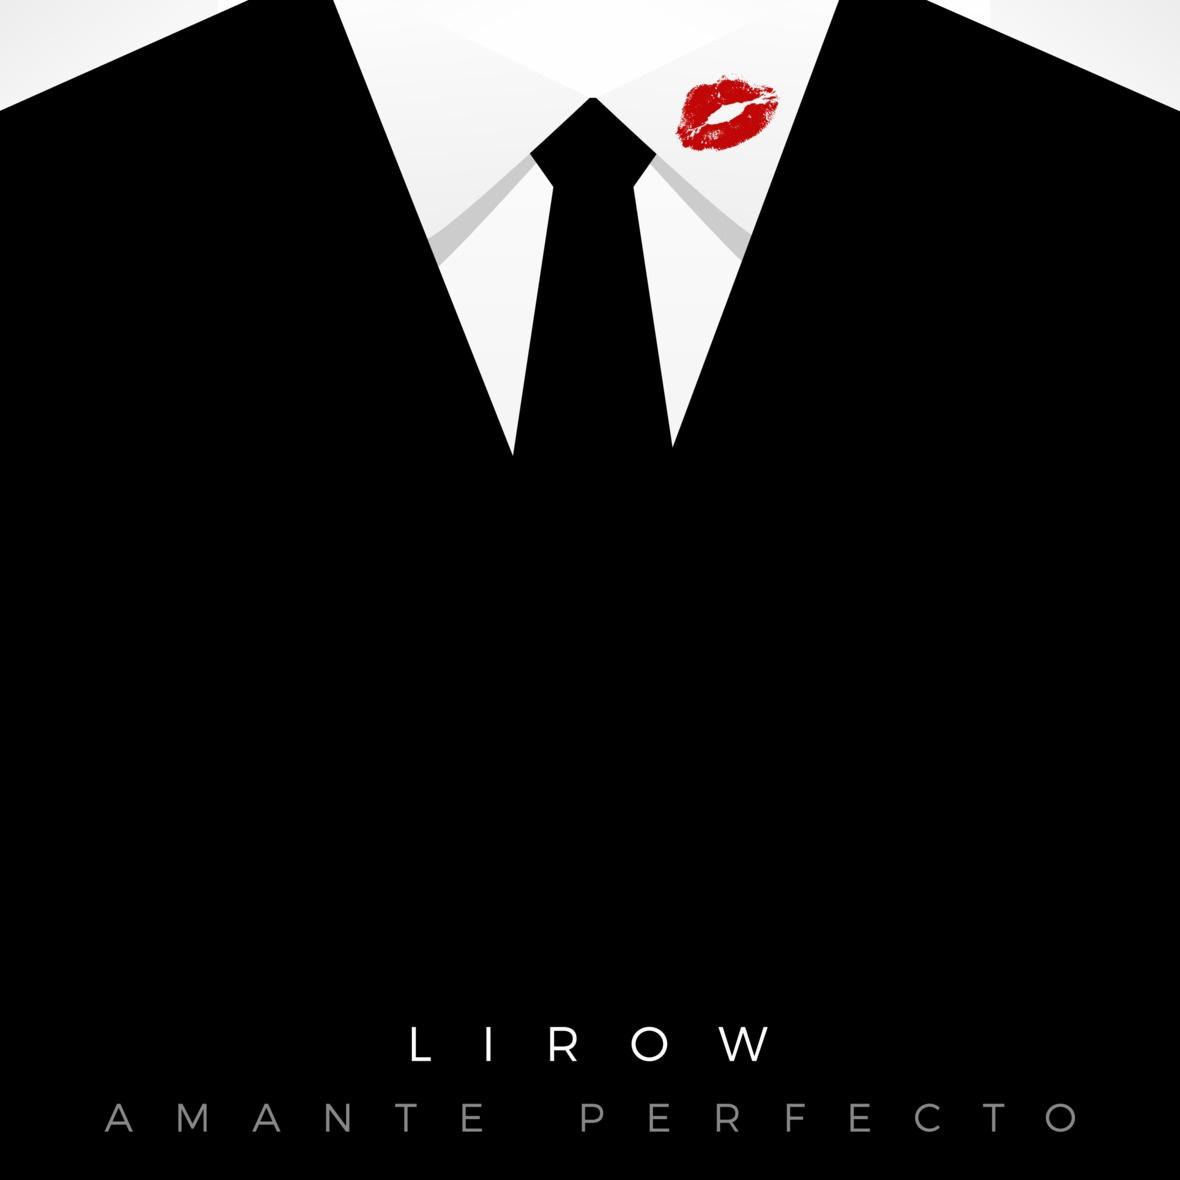 lirow